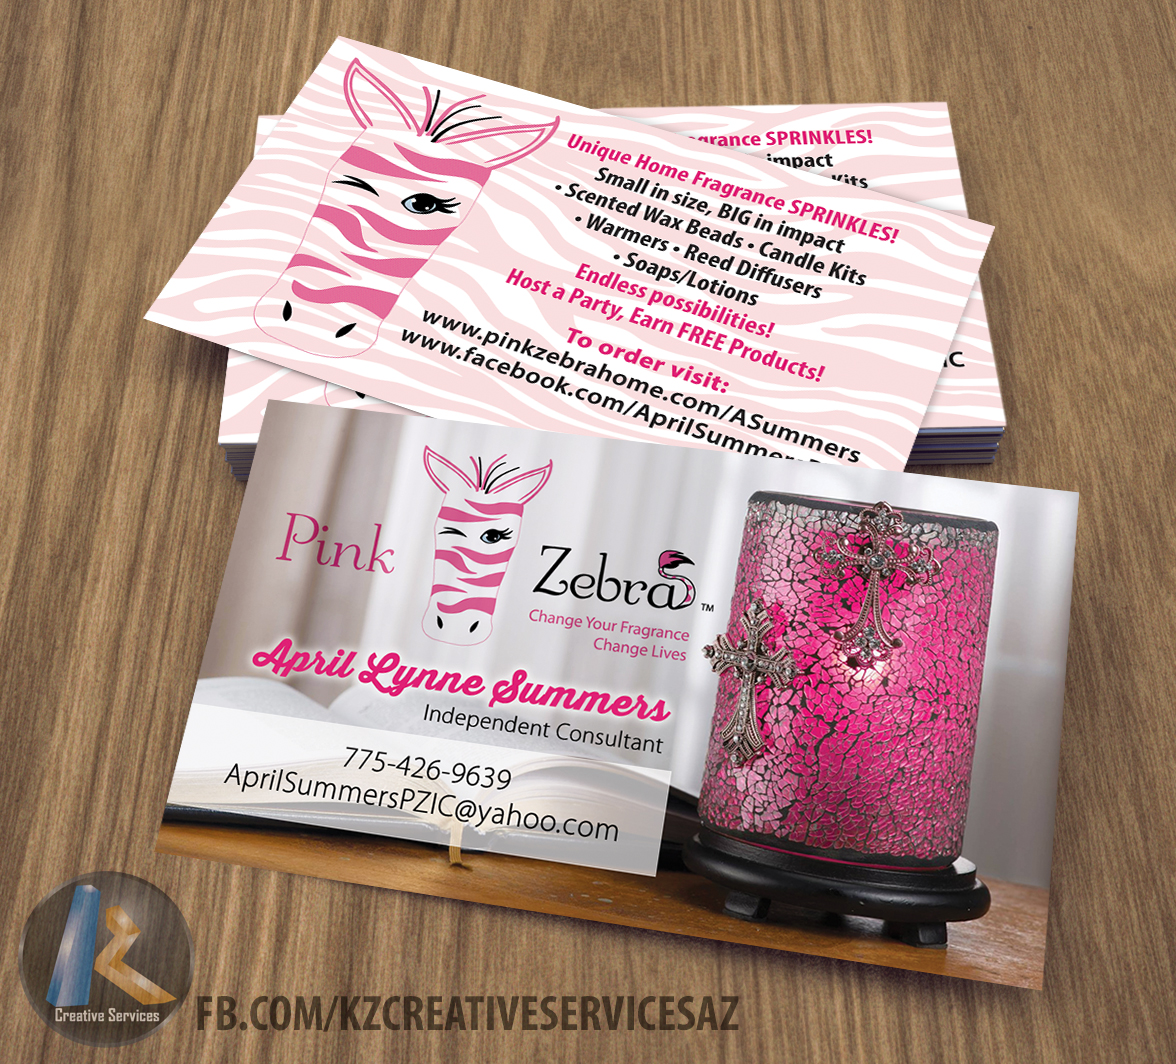 Pink zebra business cards style 2 kz creative services online pink zebra business cards style 2 colourmoves